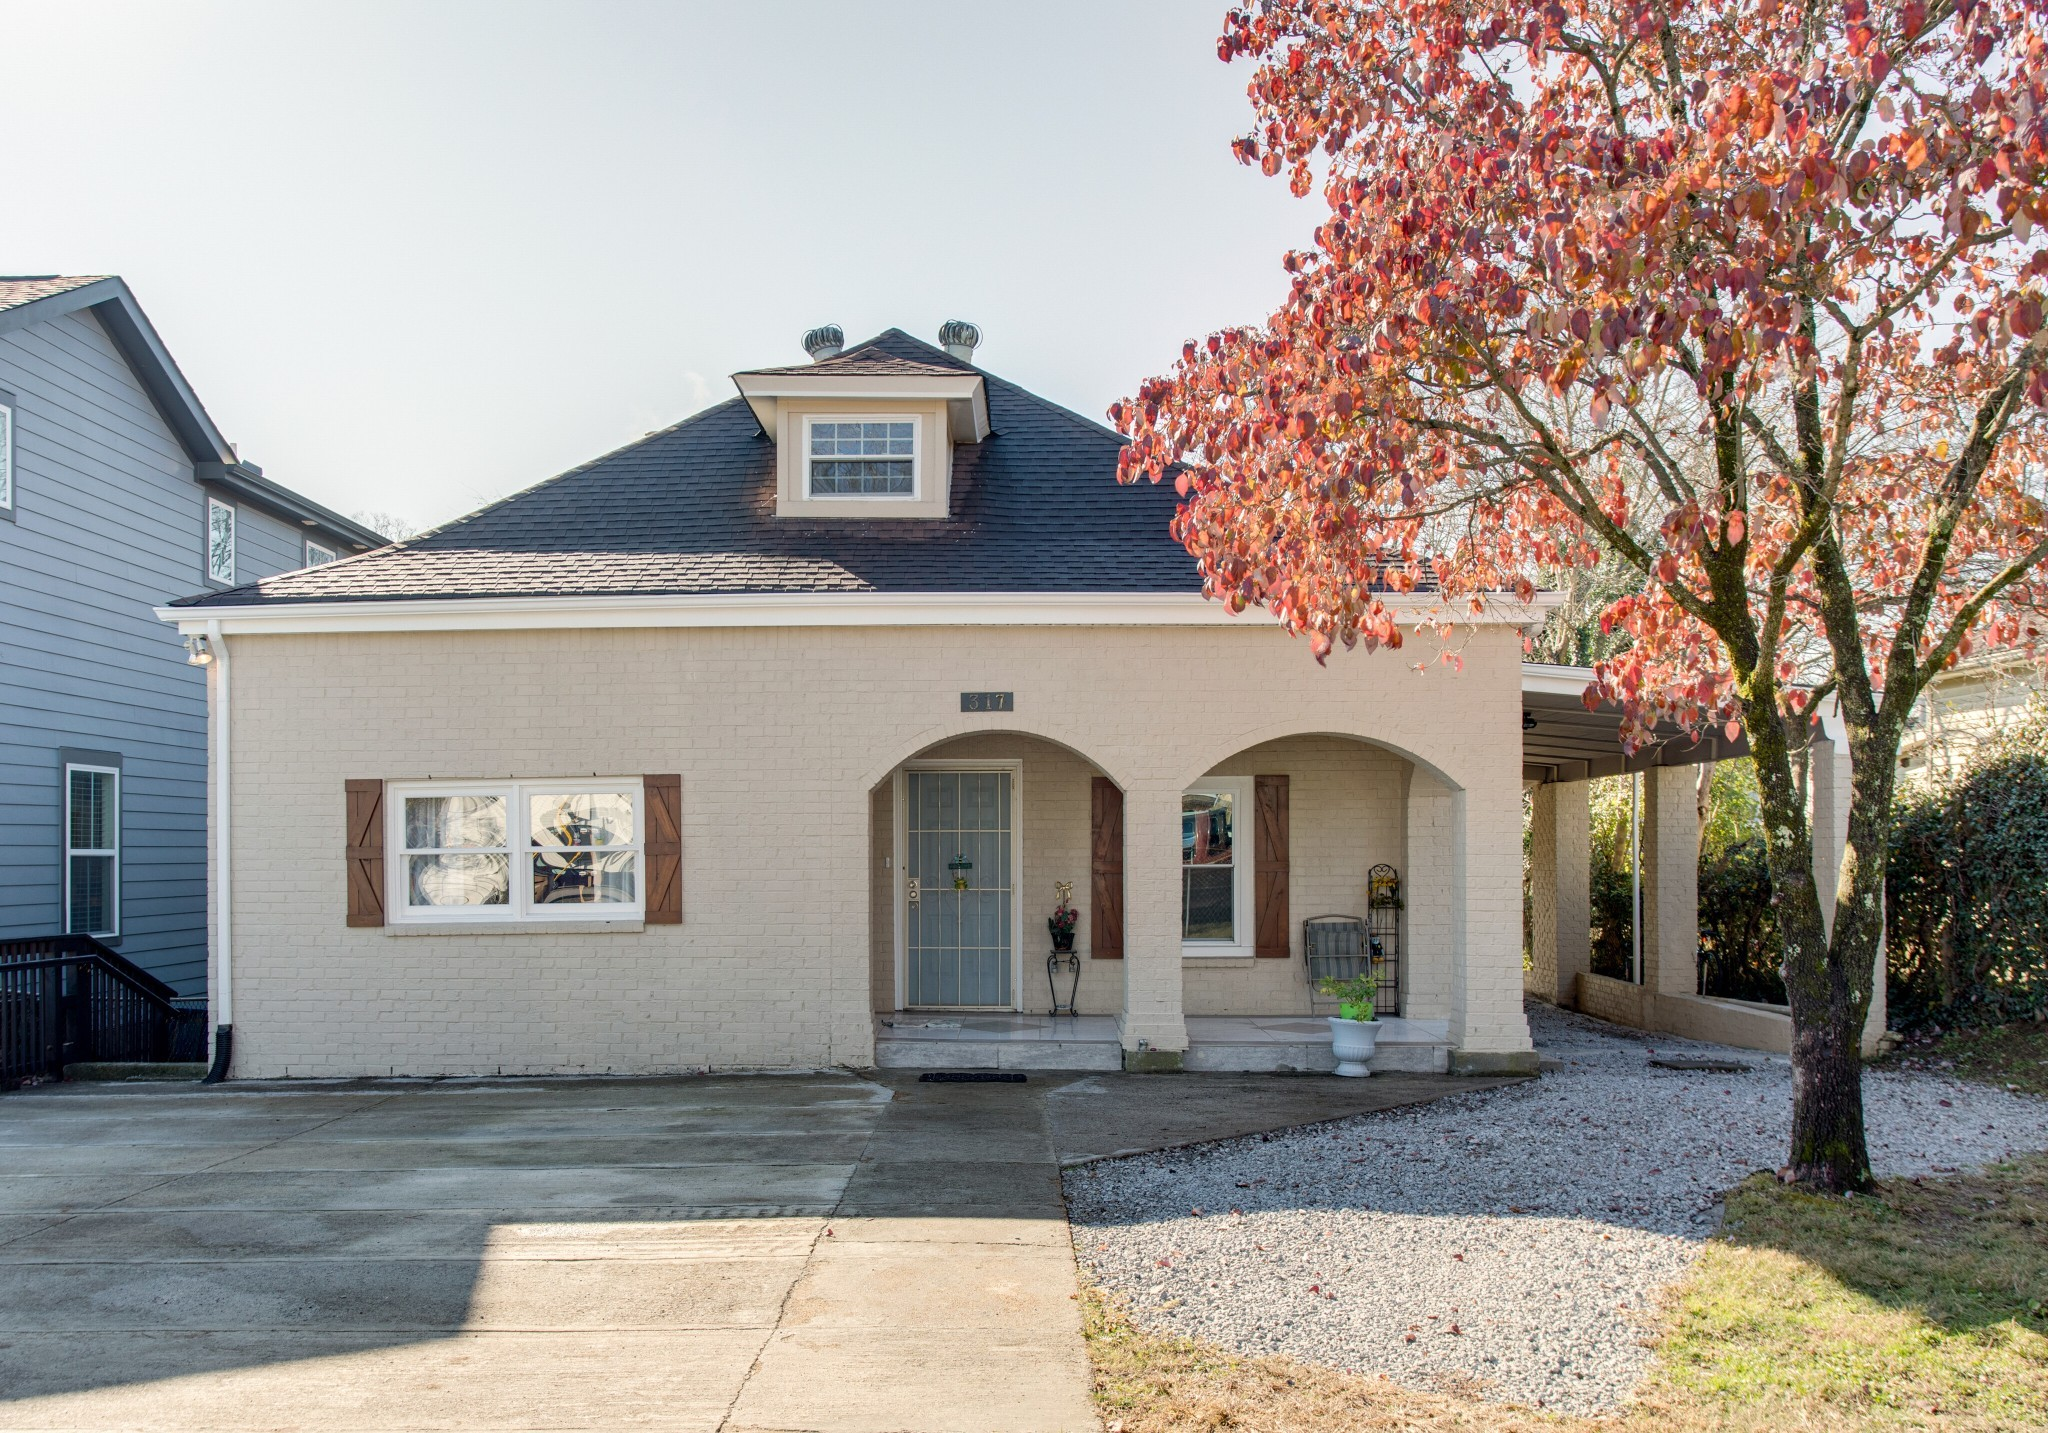 317 Leafland Ave Property Photo - Nashville, TN real estate listing